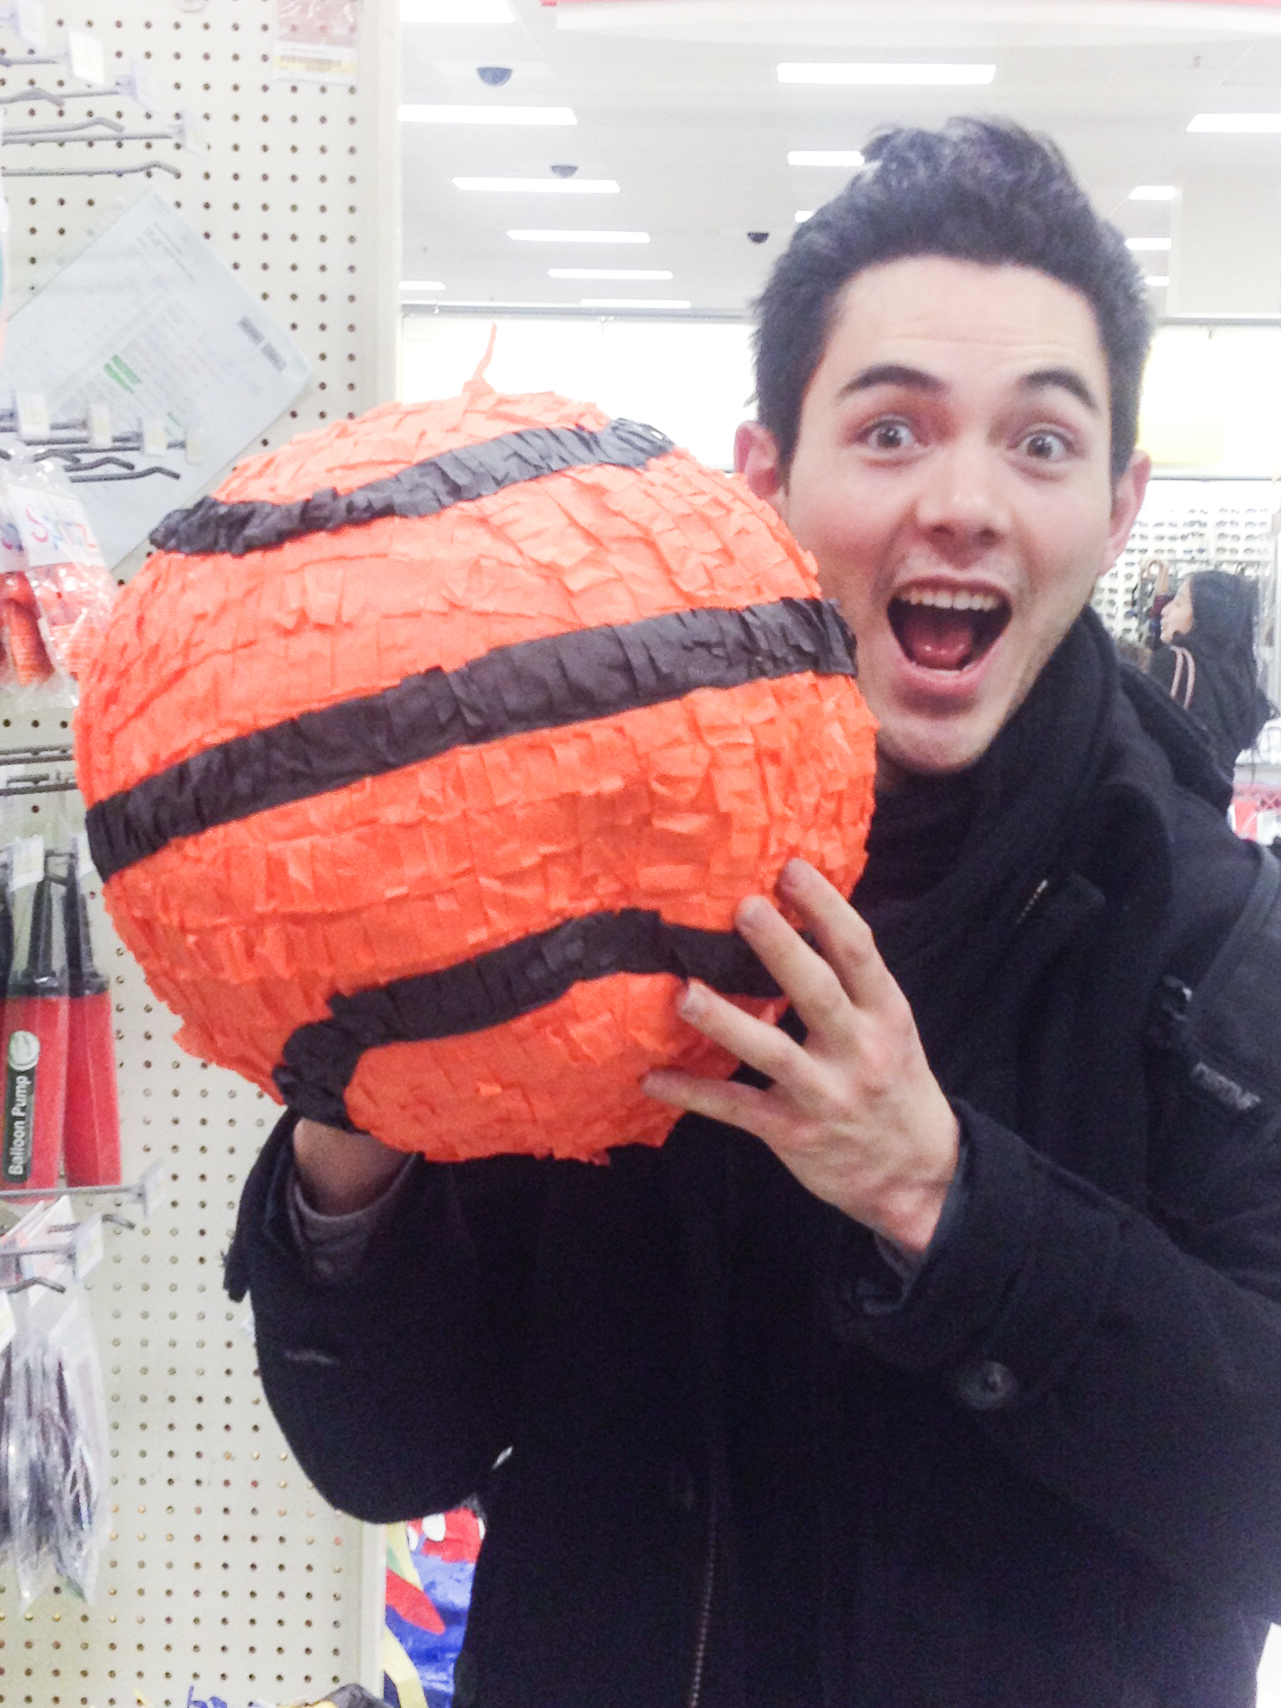 piñatas are fun for everyone!